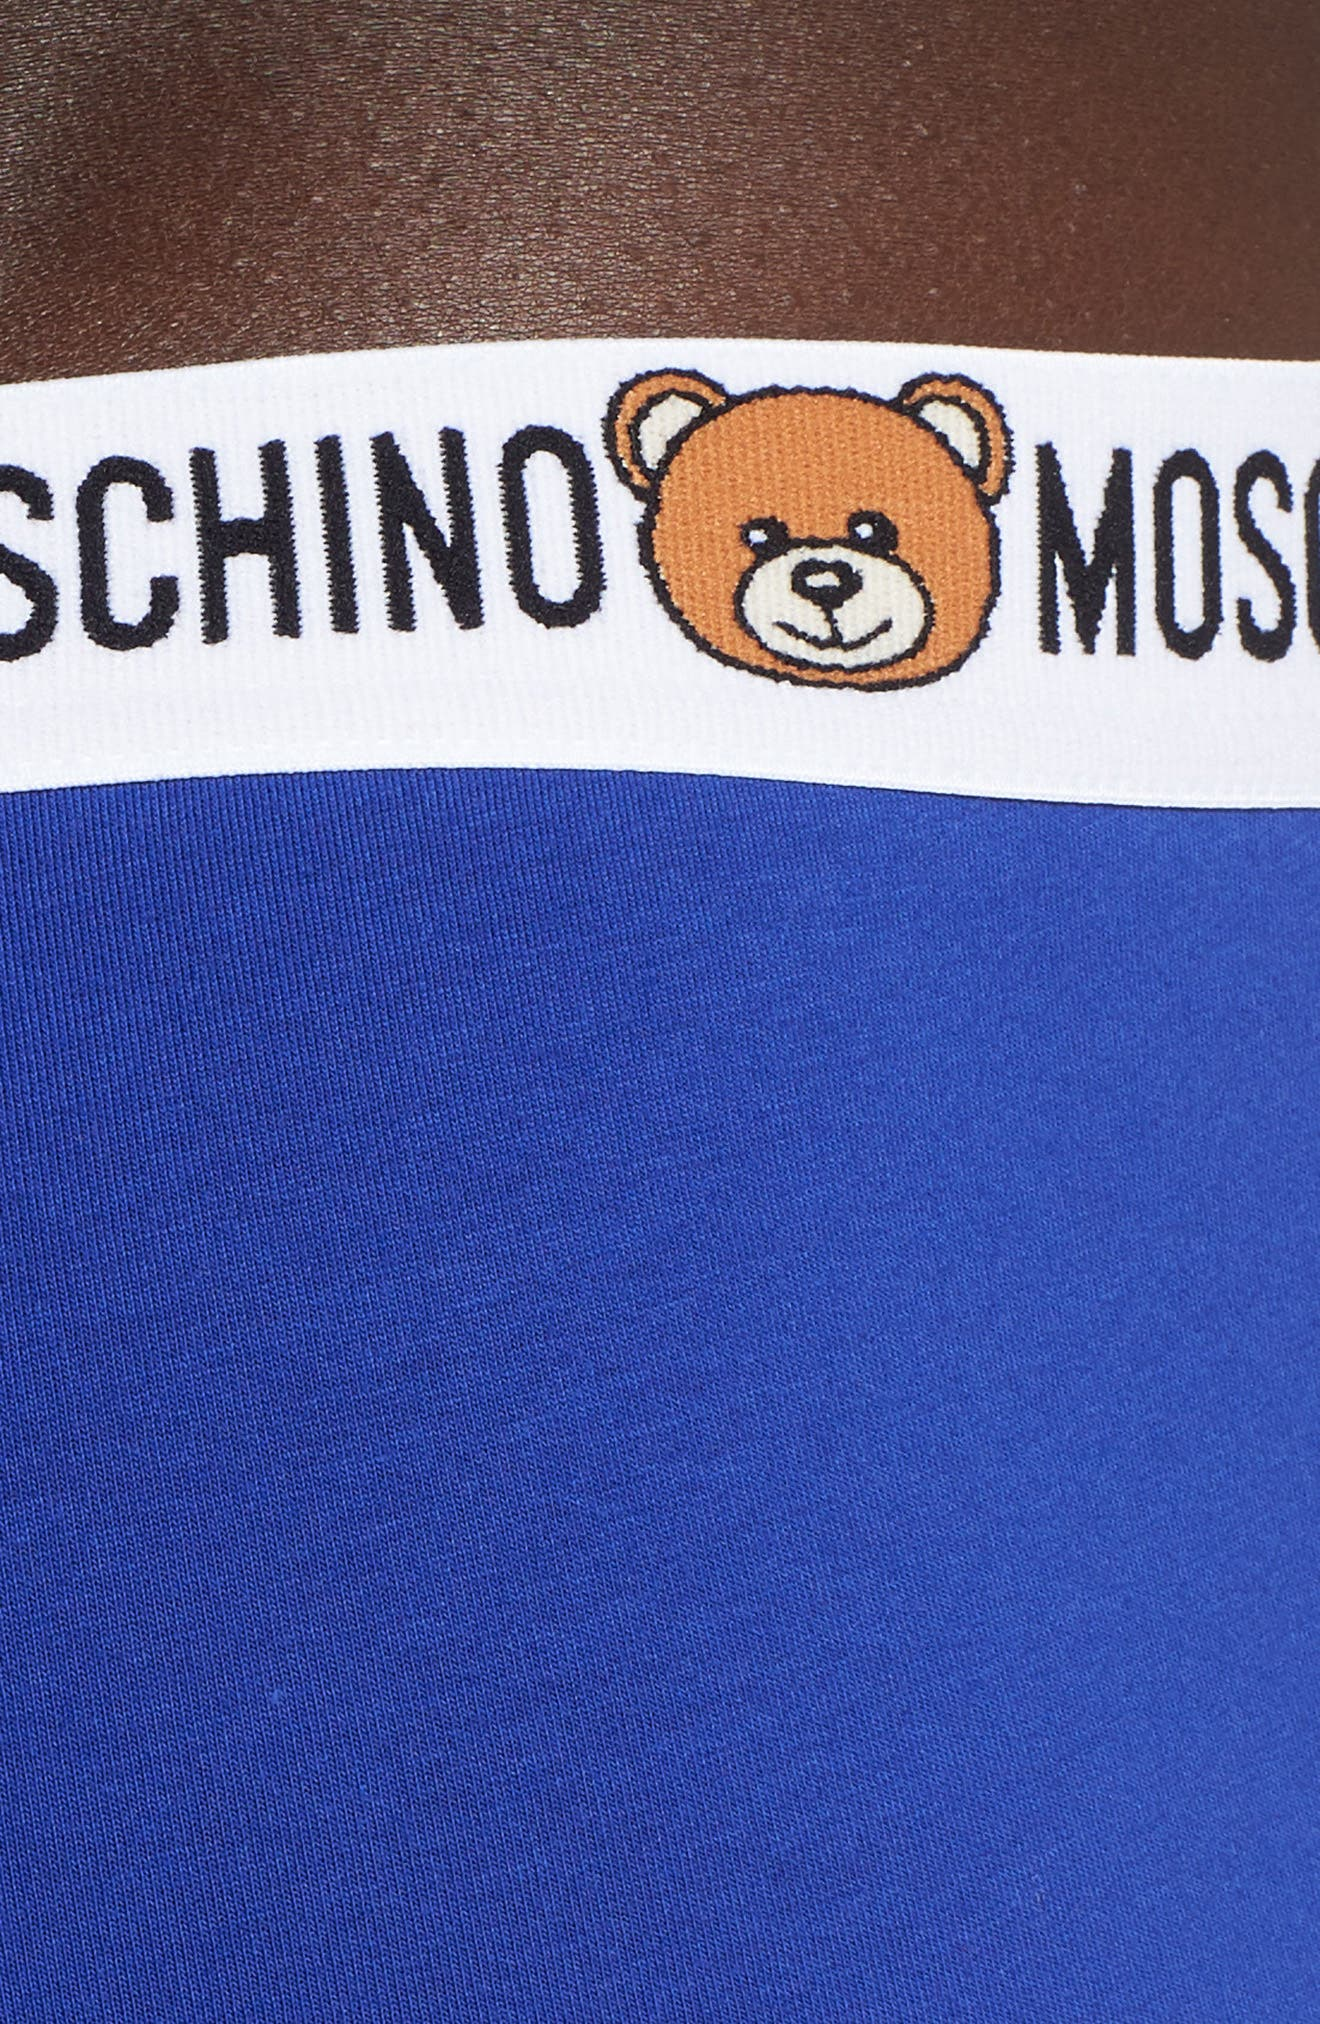 Moschino Pants Underbear Trunks